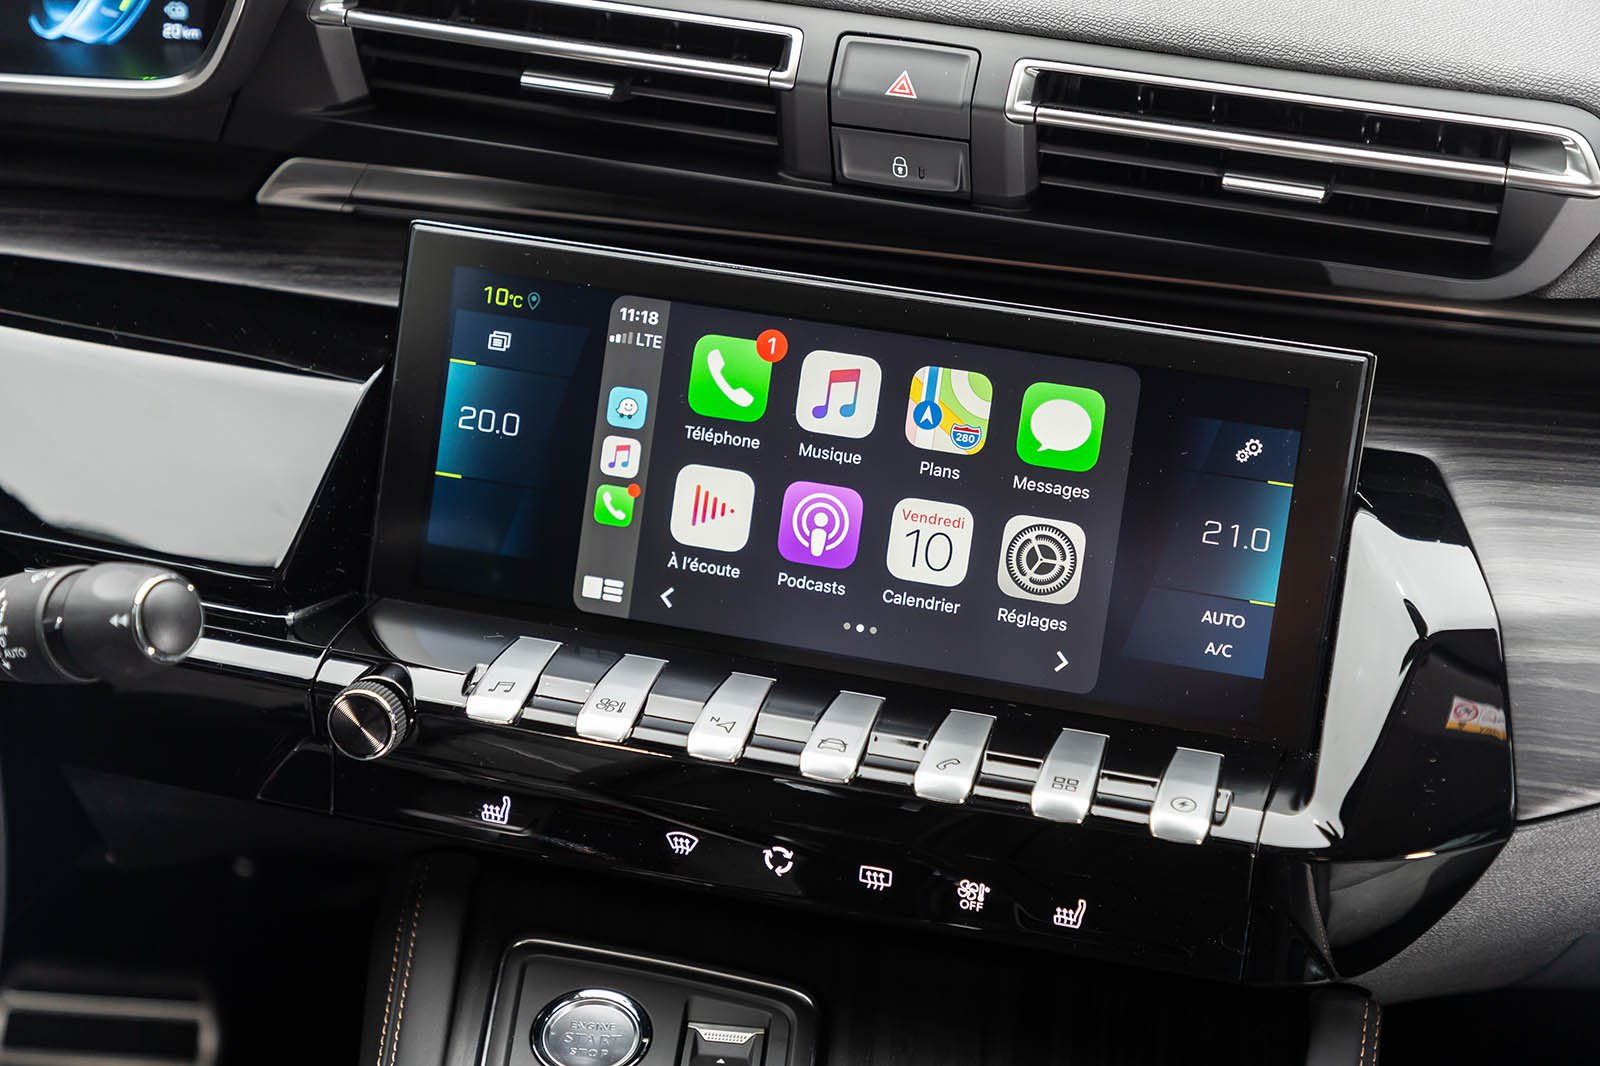 Peugeot 508 Hatchback Hybrid 2020 infotainment LHD